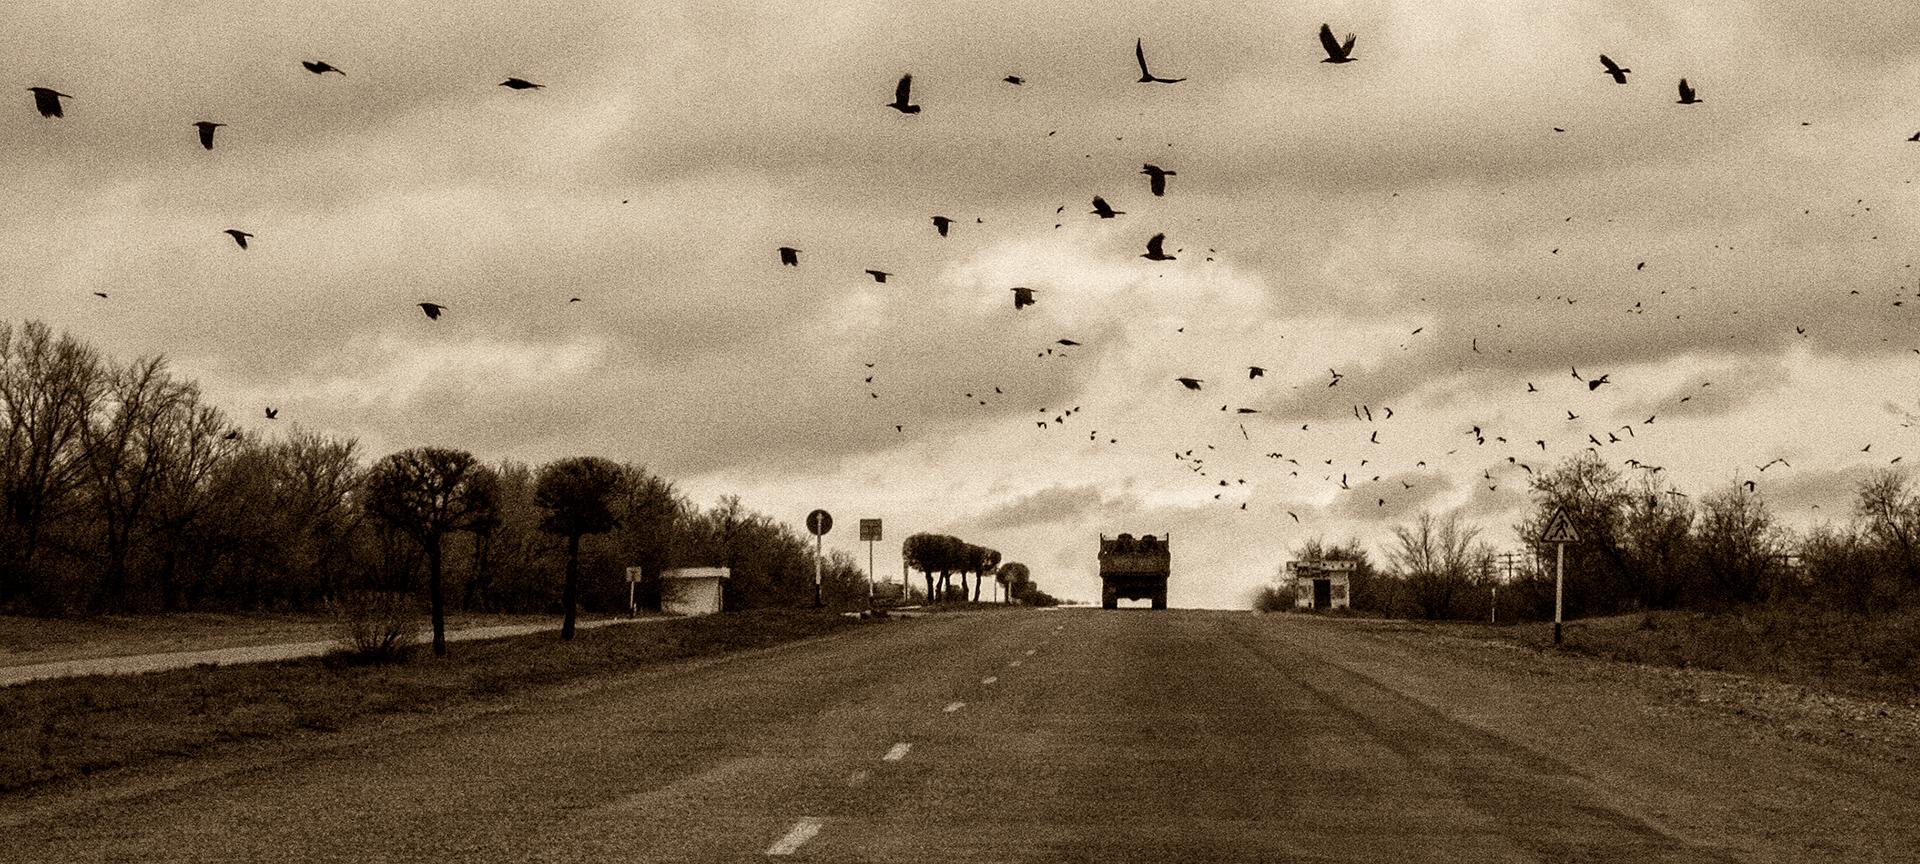 Kapchagay highway, Kazakhstan, crows, birds